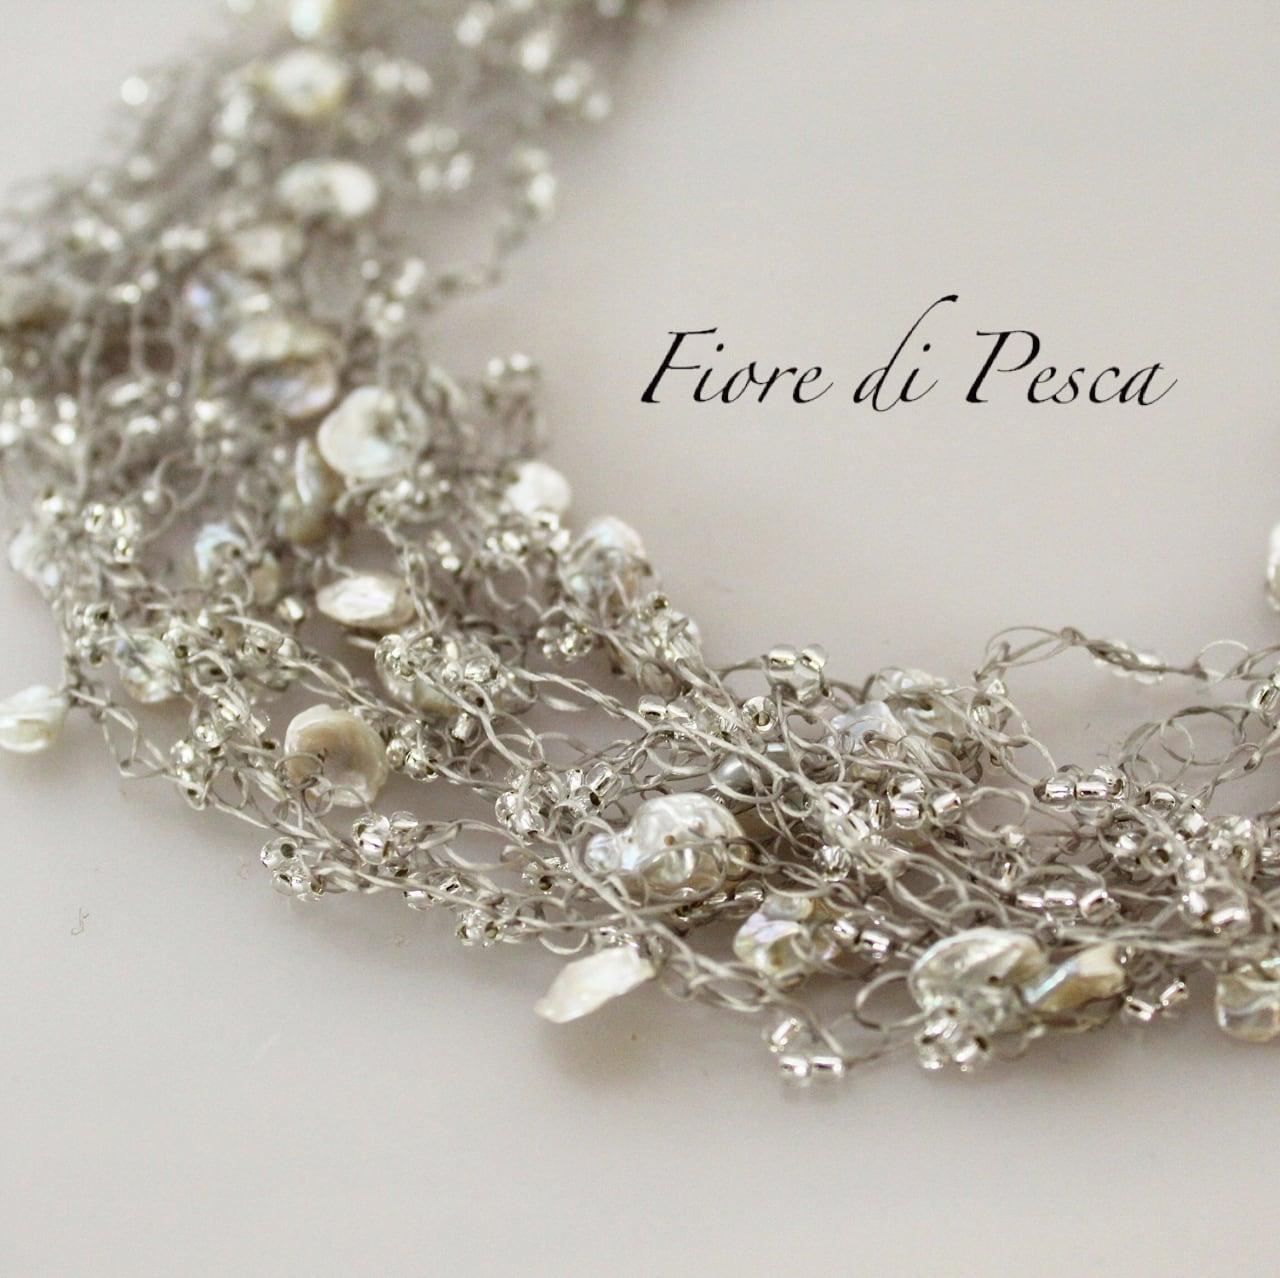 Croshet (silver x  keshipearl) Necklace